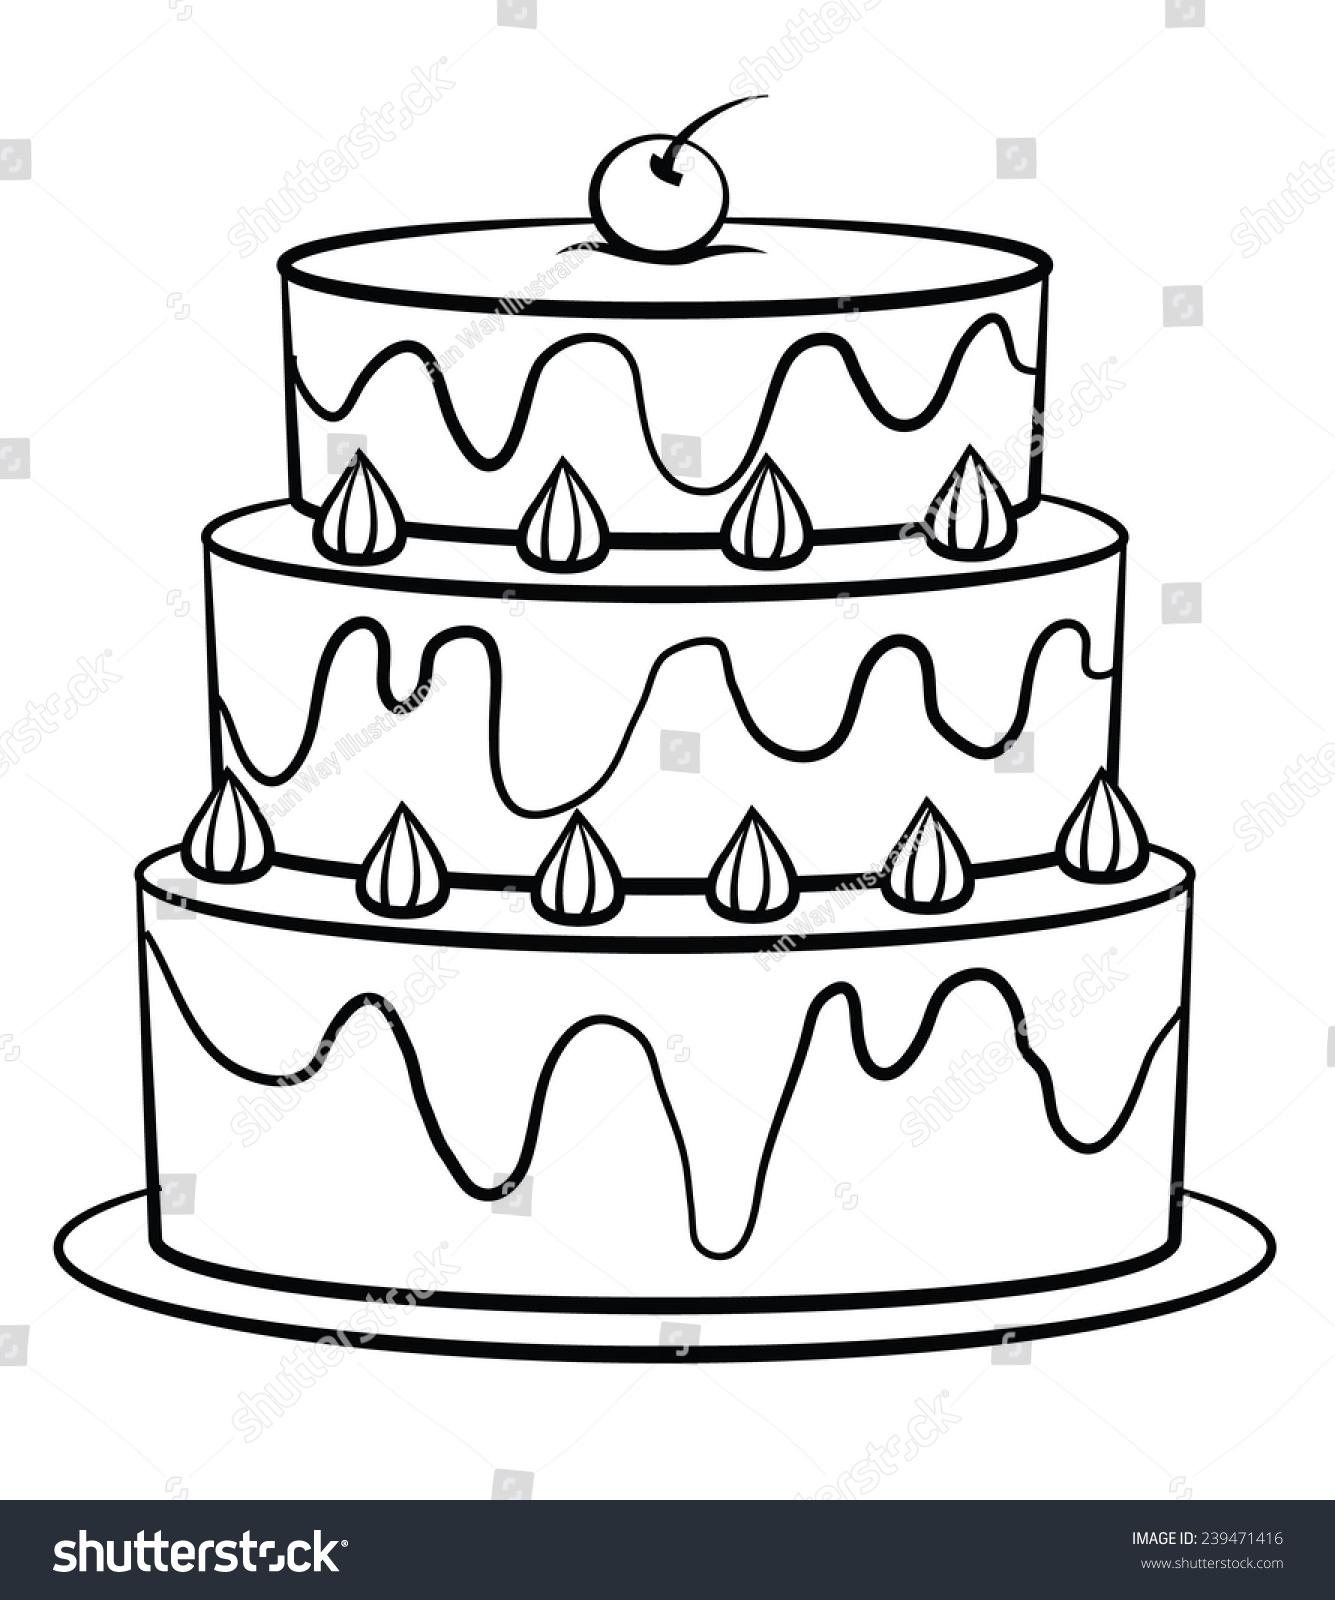 Royalty Free Stock Illustration Of Black White Birthday Cake Stock